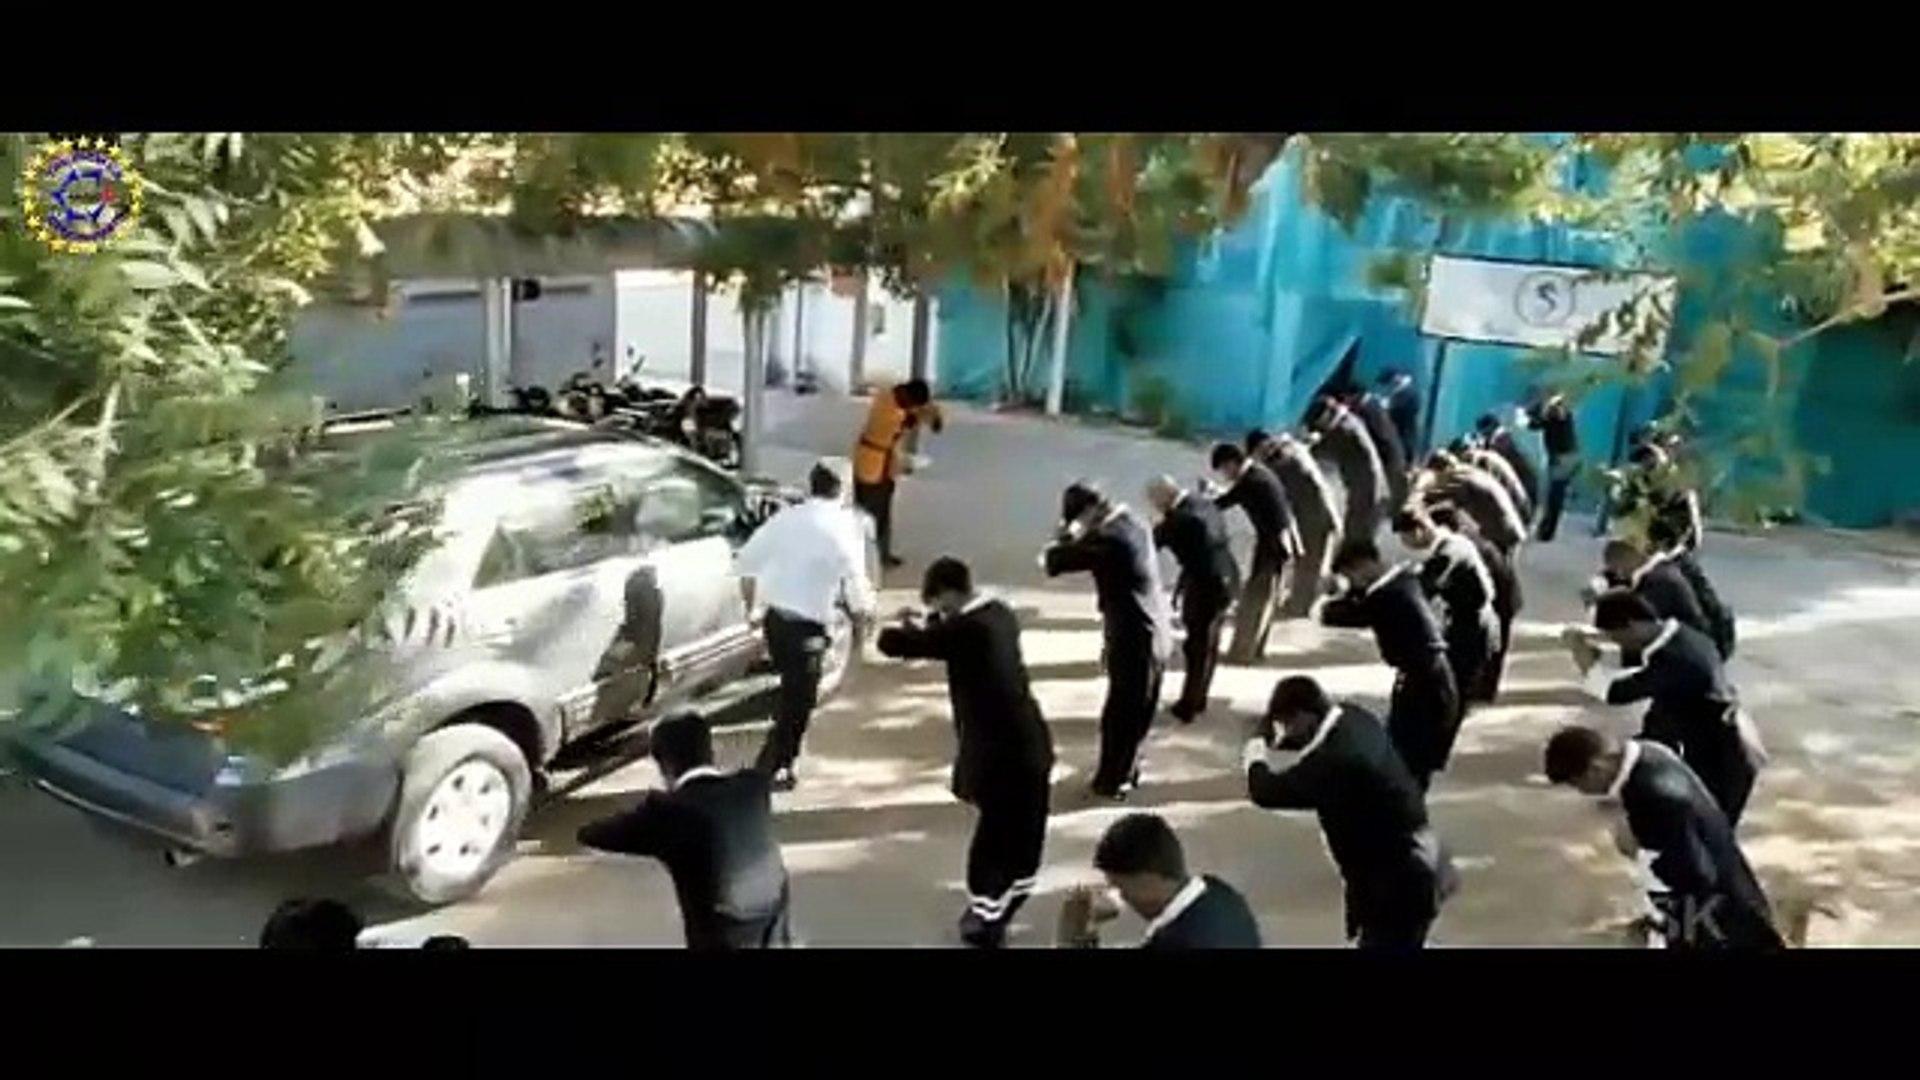 Mr. kee- jaanbaaz khiladi south new movie 2018 in hindi  part - 1 , south indian movie 2018 Mr. Kee-